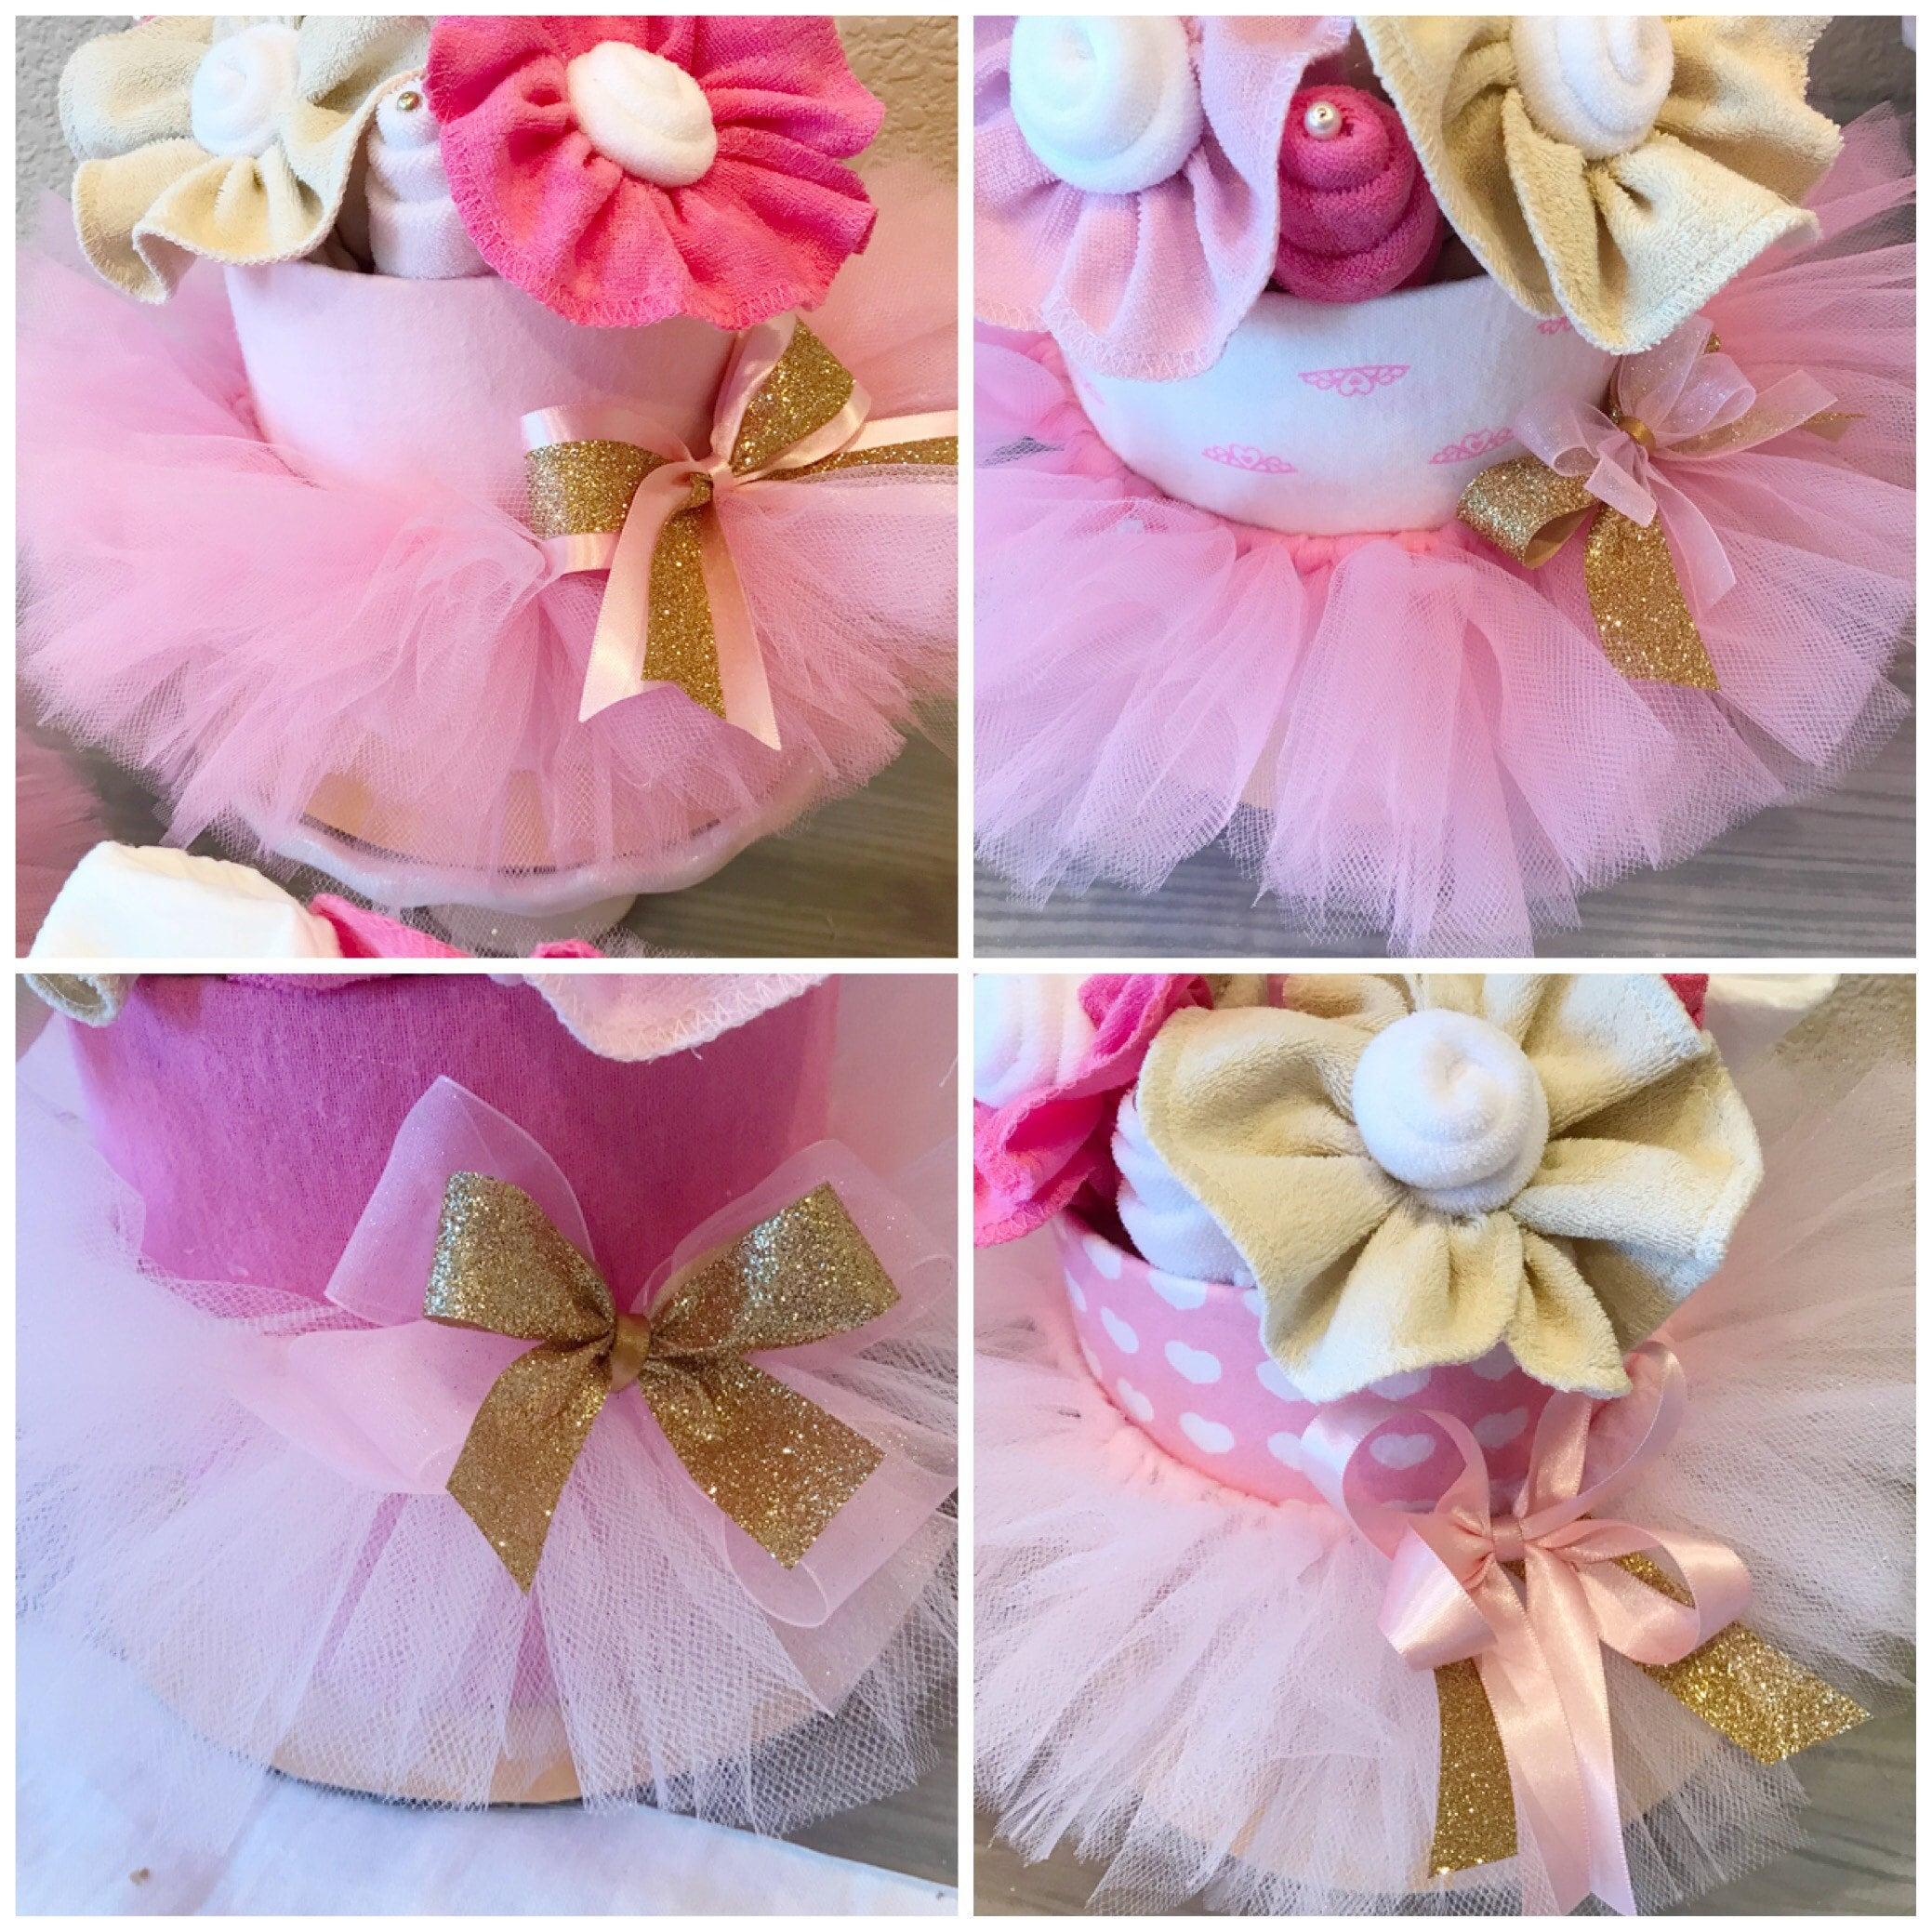 Pink tutu ballerina baby shower centerpieces and